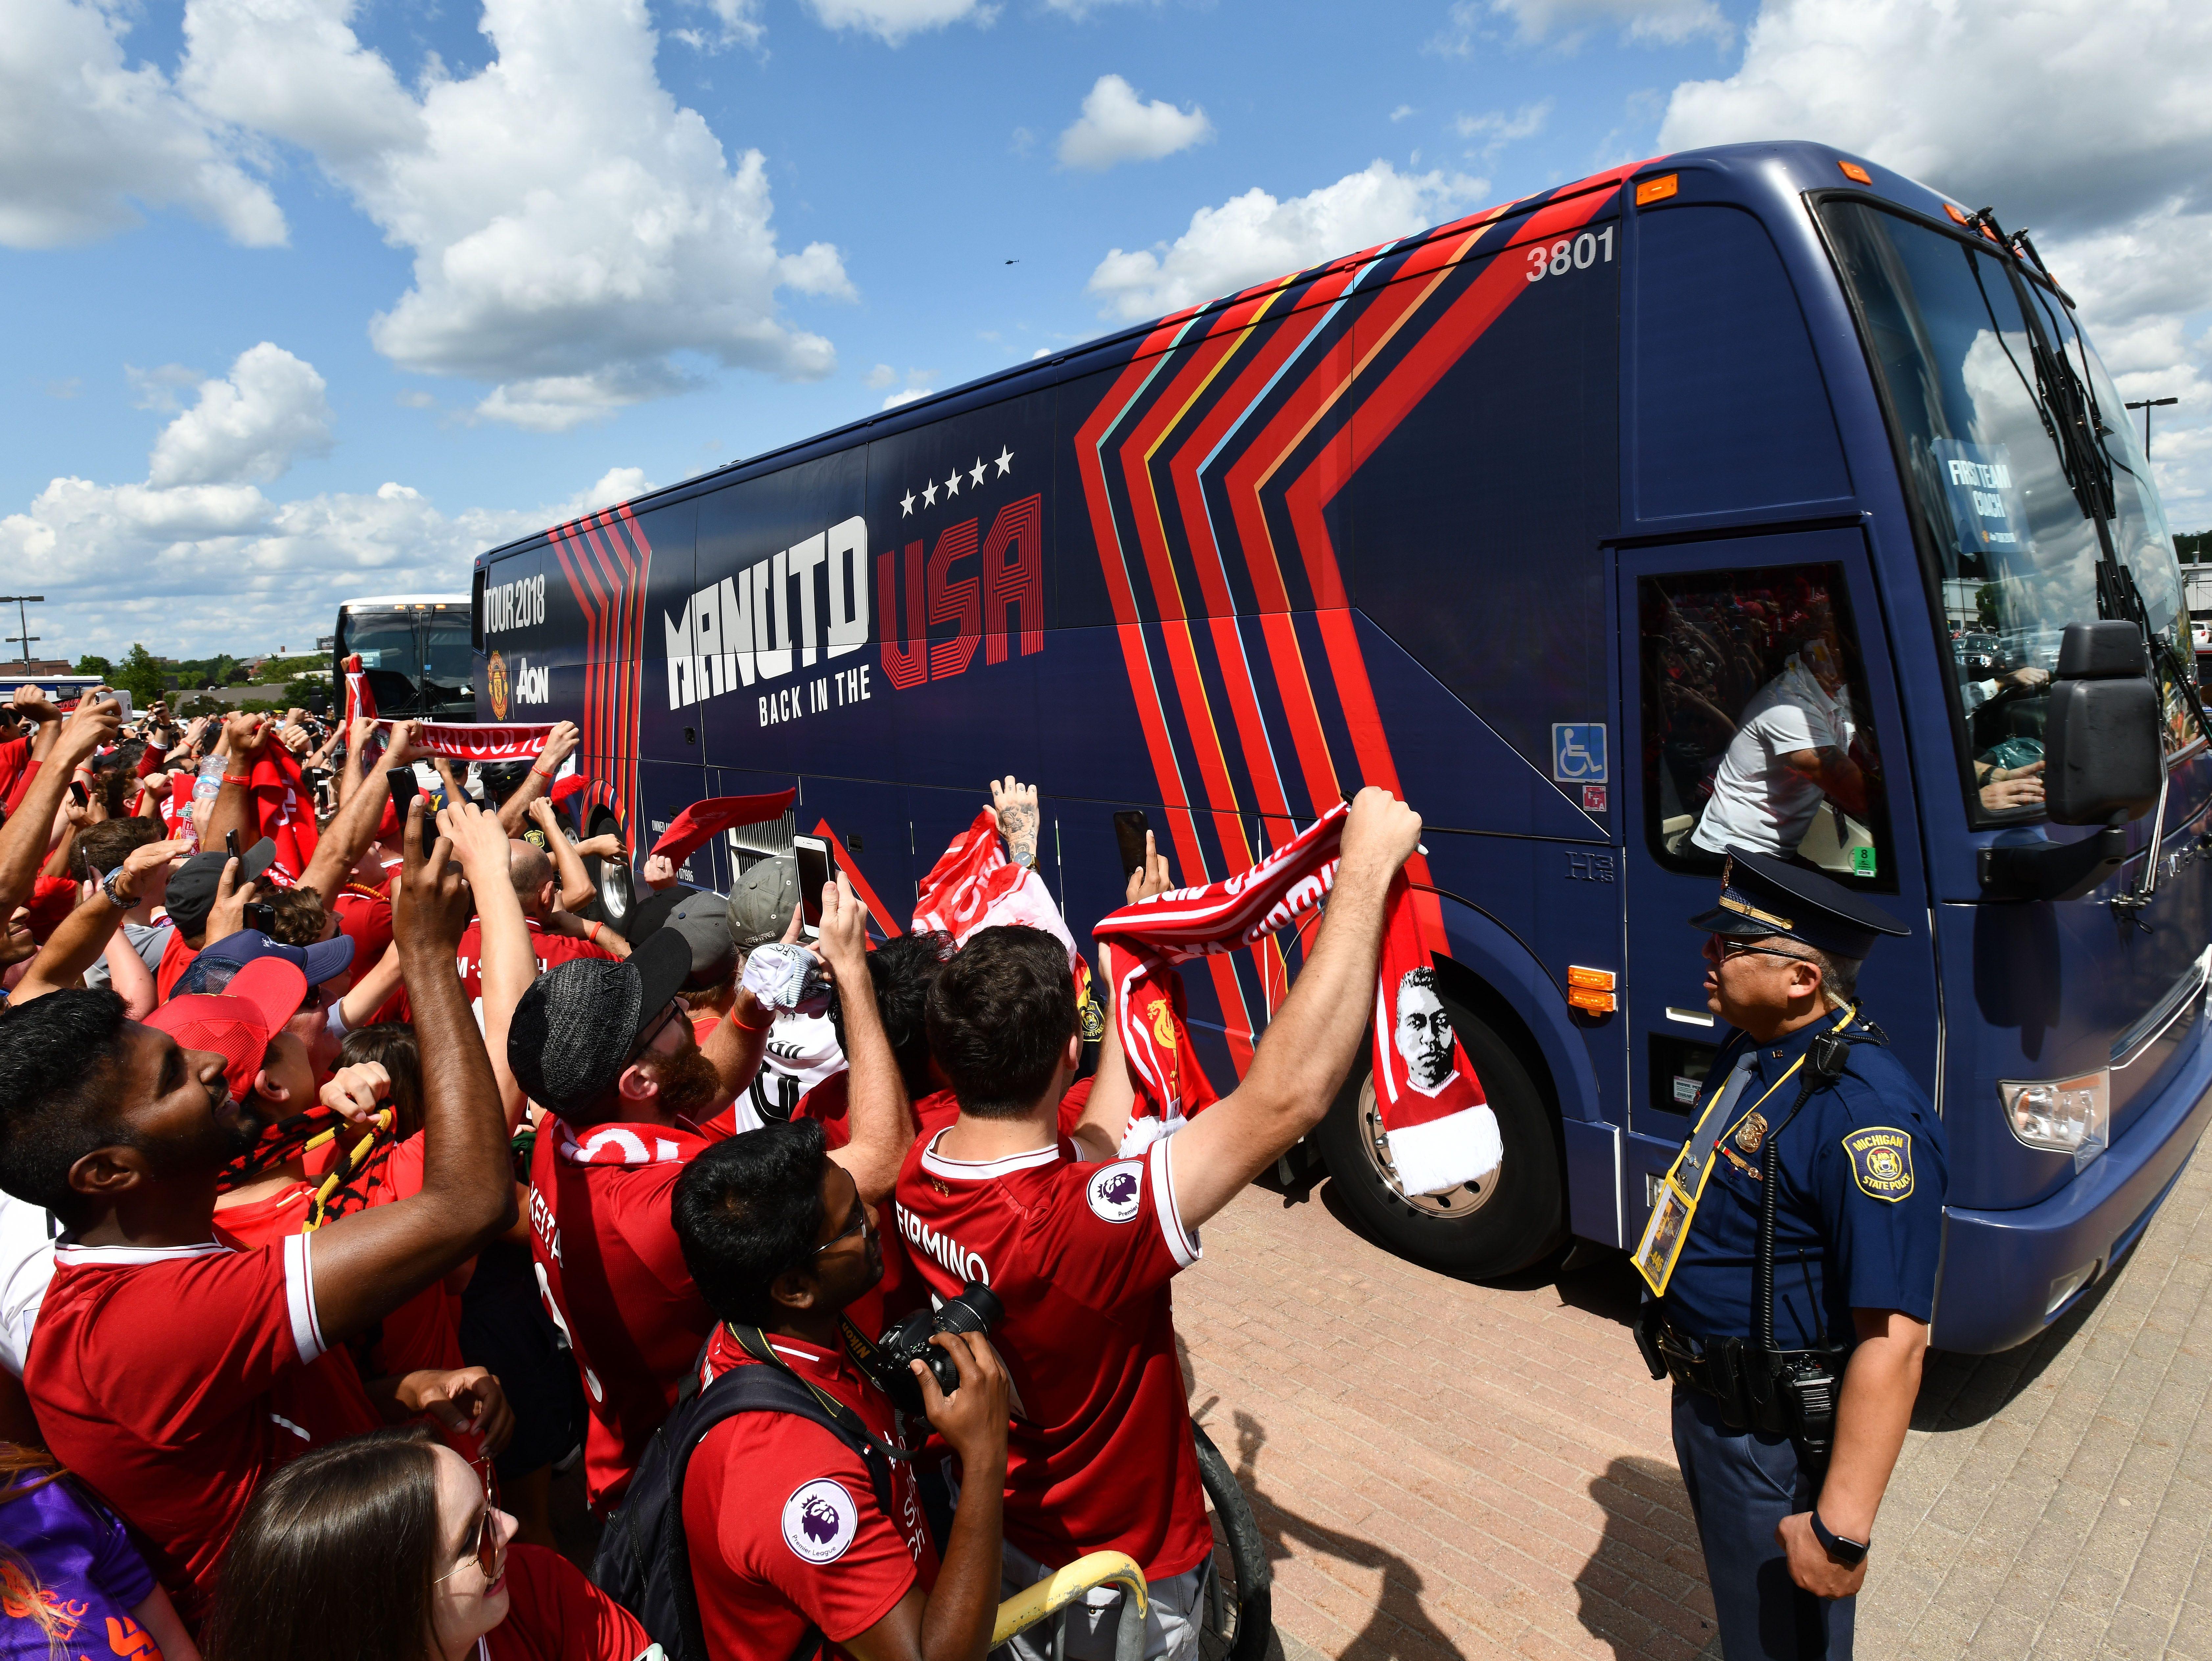 Manchester United bus arrives.